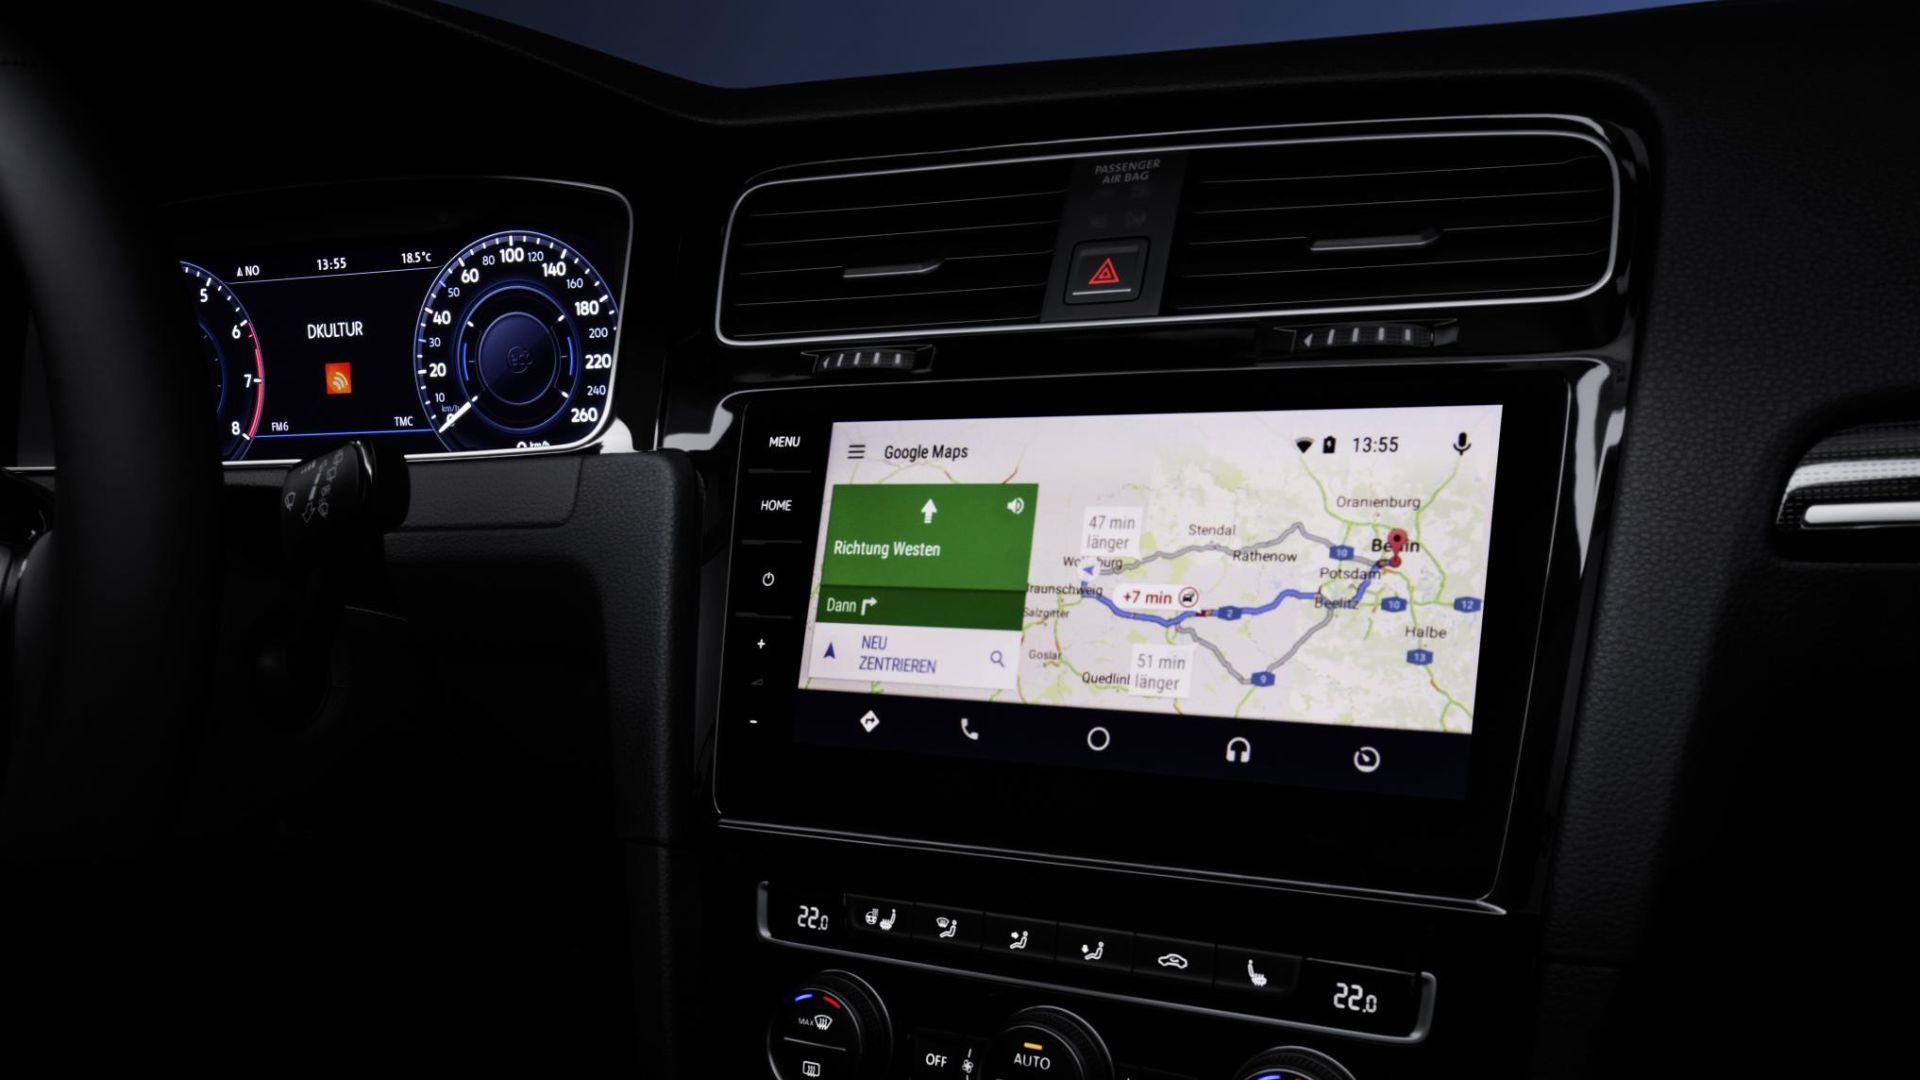 google maps car built-in